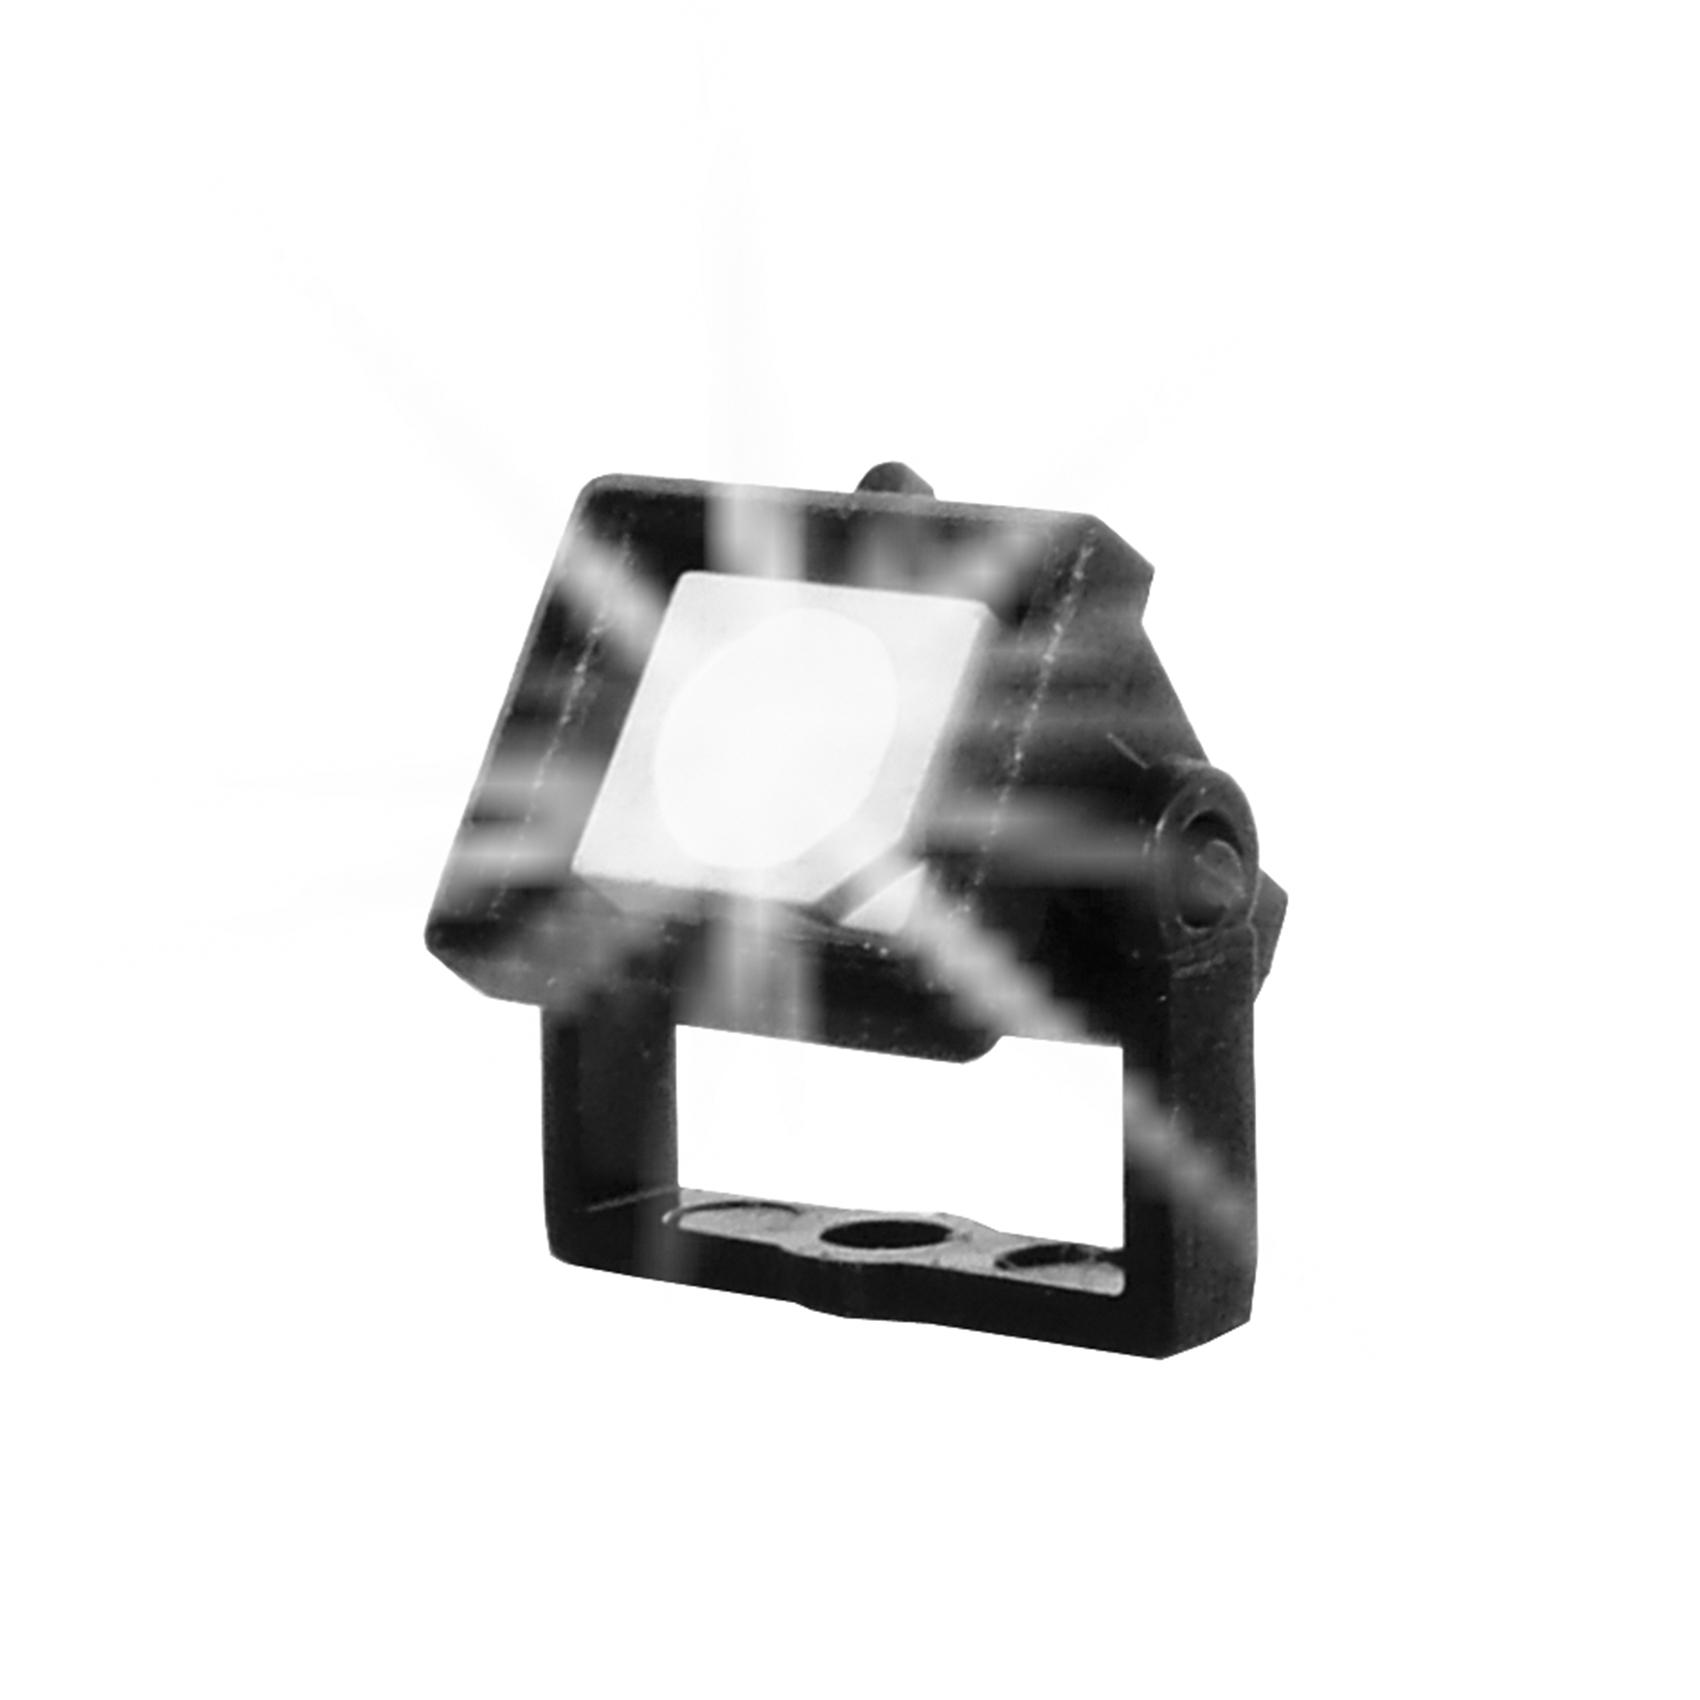 Viessmann 6333 <br/>Flutlichtstrahler, 1-flammig, LED